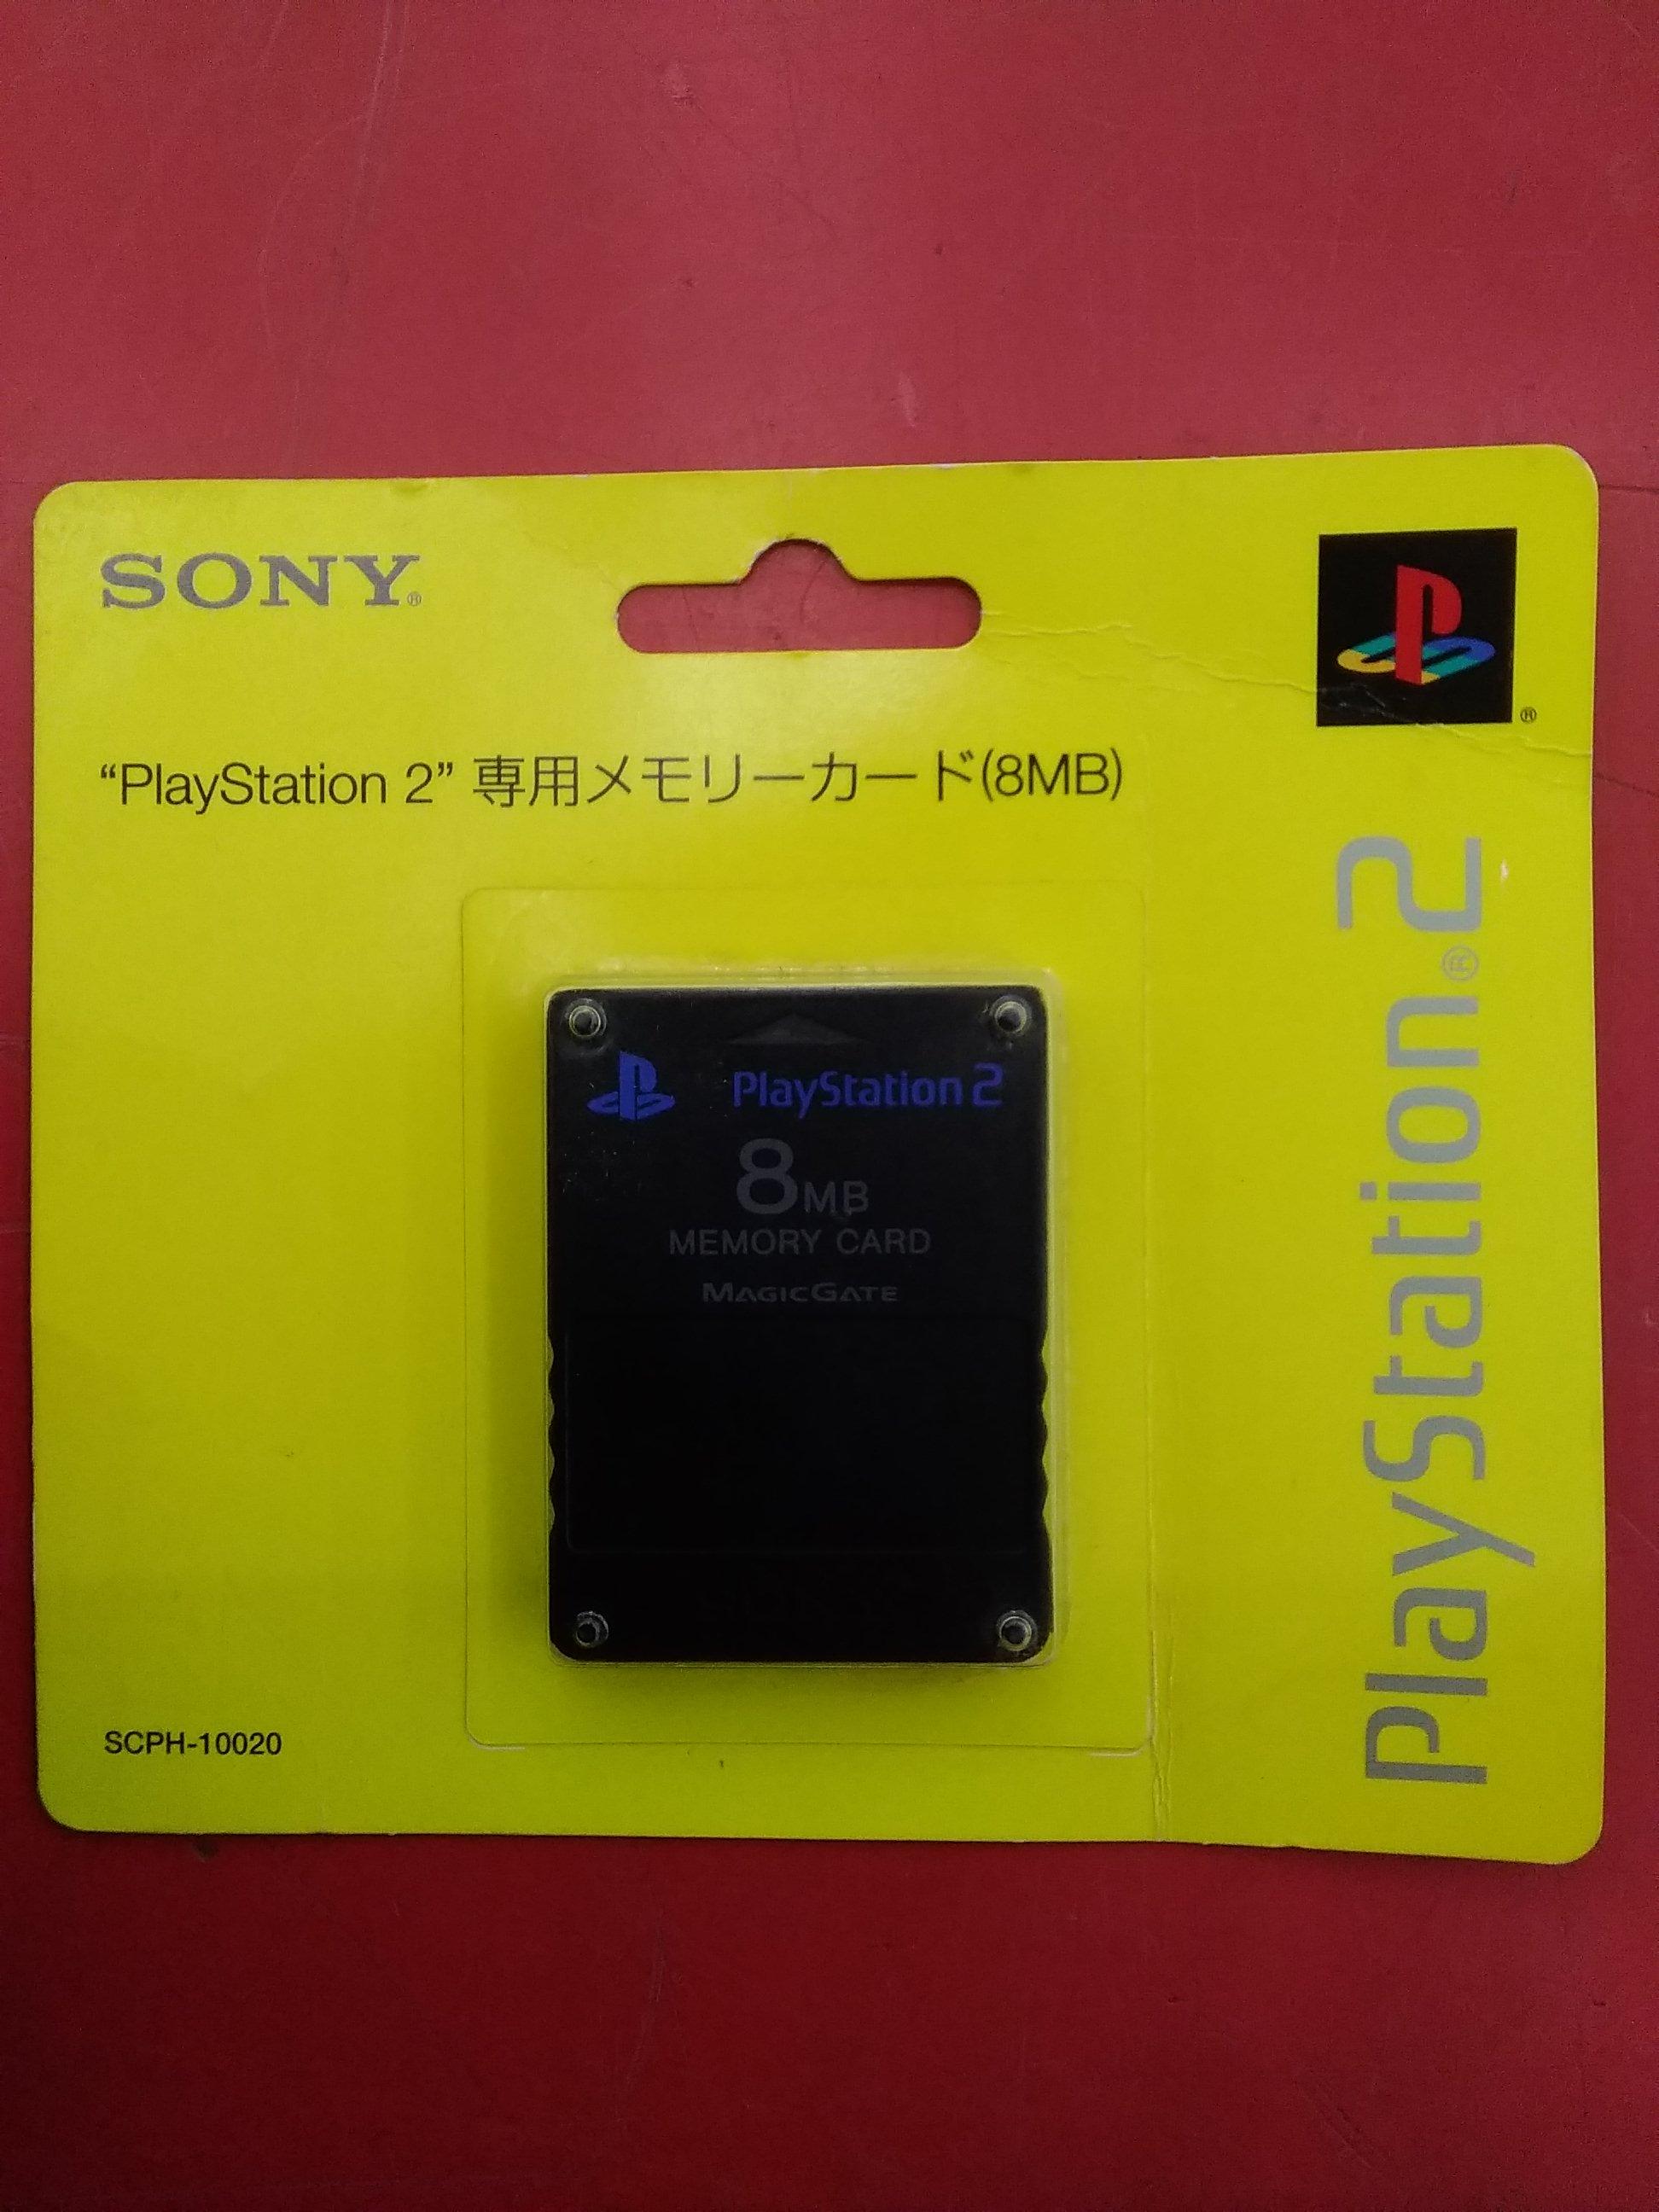 PLAYSTATION2専用メモリーカード|SONY